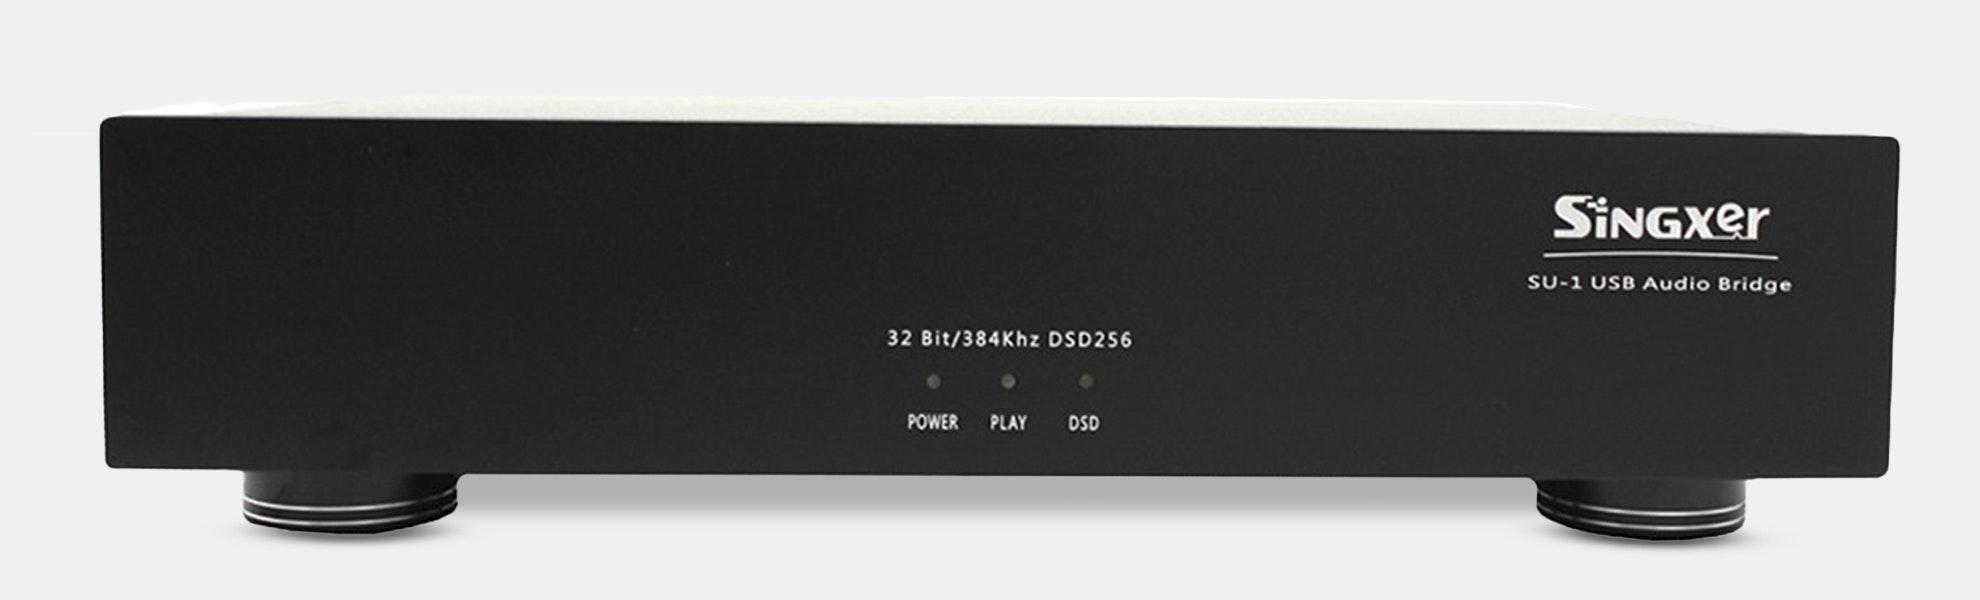 Singxer SU-1 USB Digital Interface